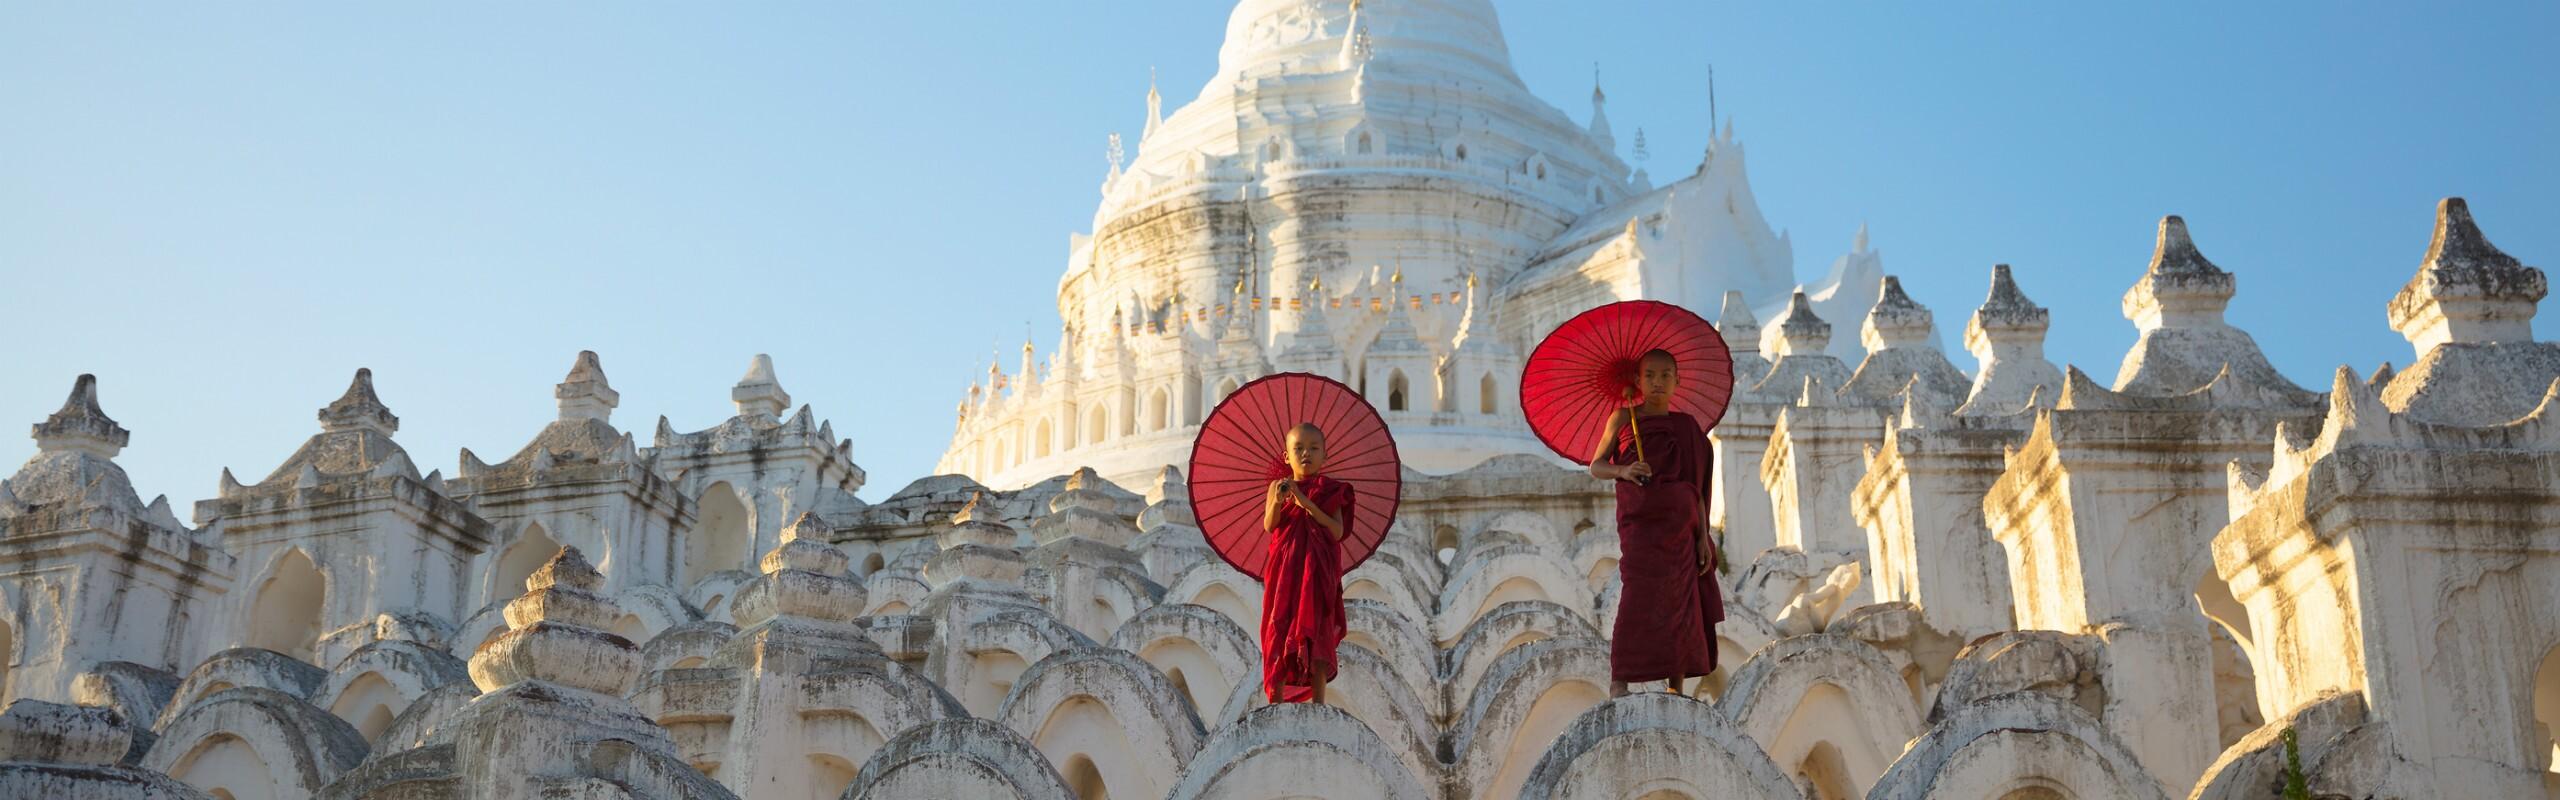 April Weather in Mandalay - Burning Hot